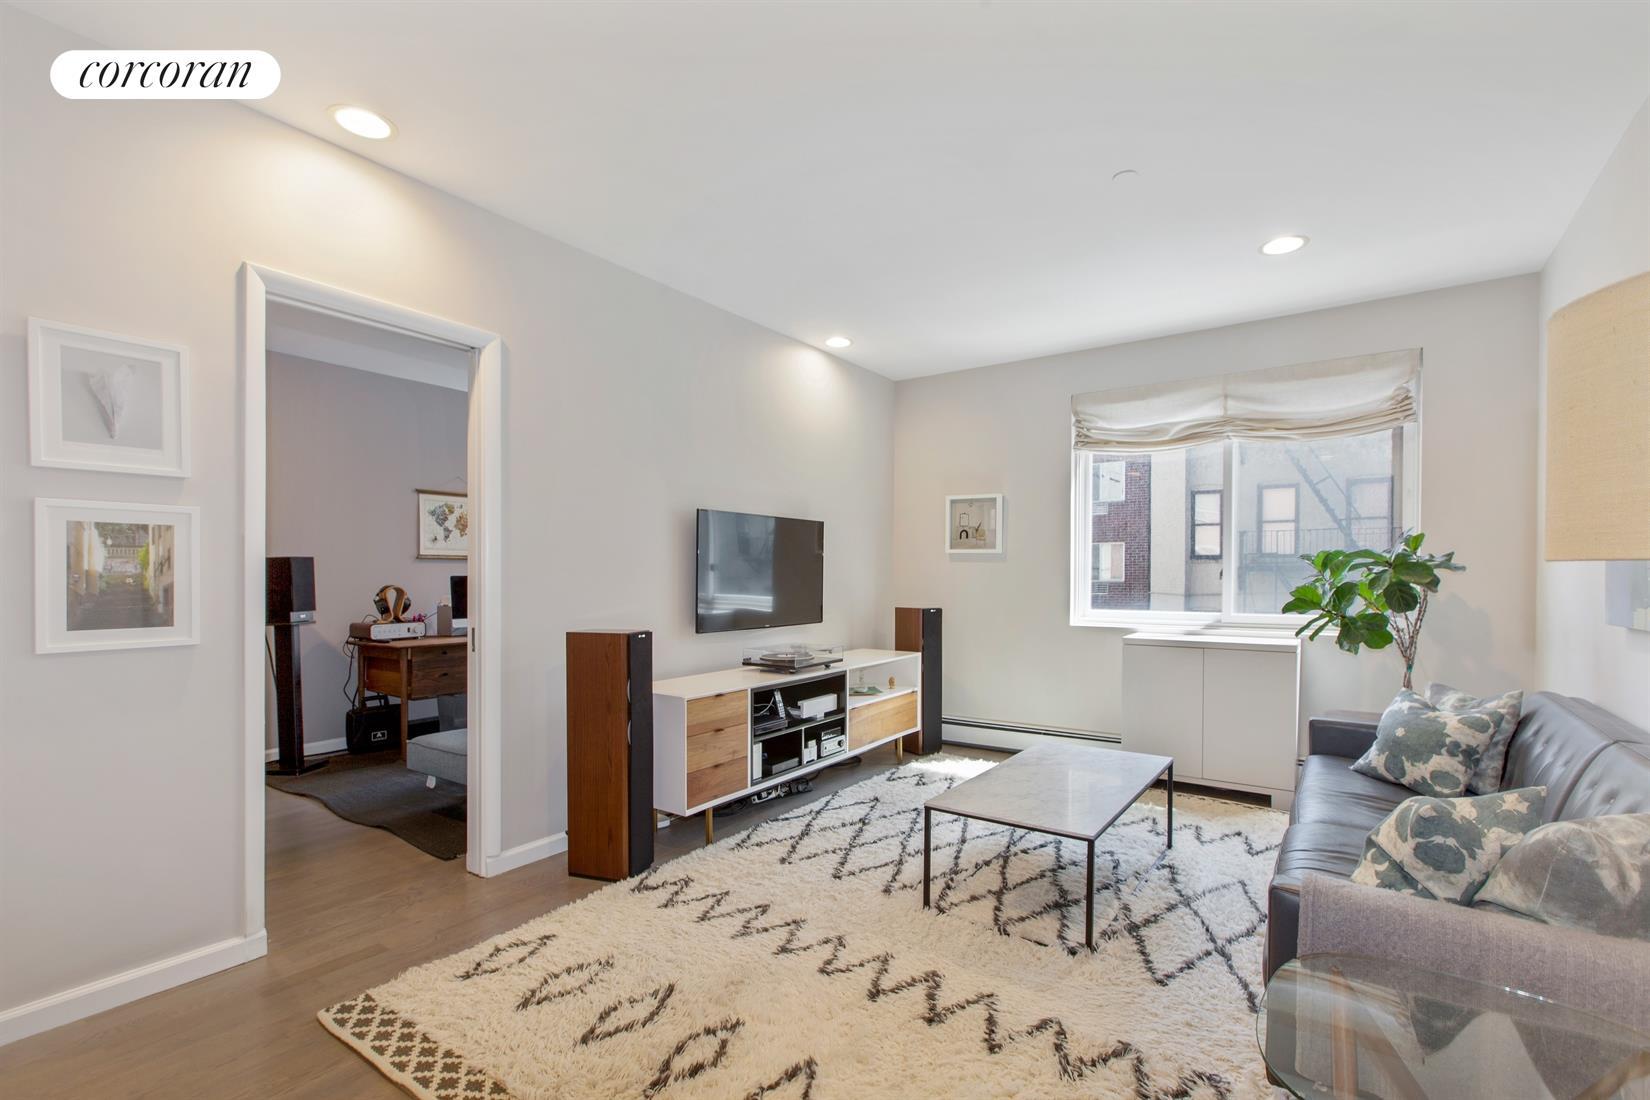 Corcoran, 236 South 1st Street, Apt. 3c, Williamsburg Real Estate ...